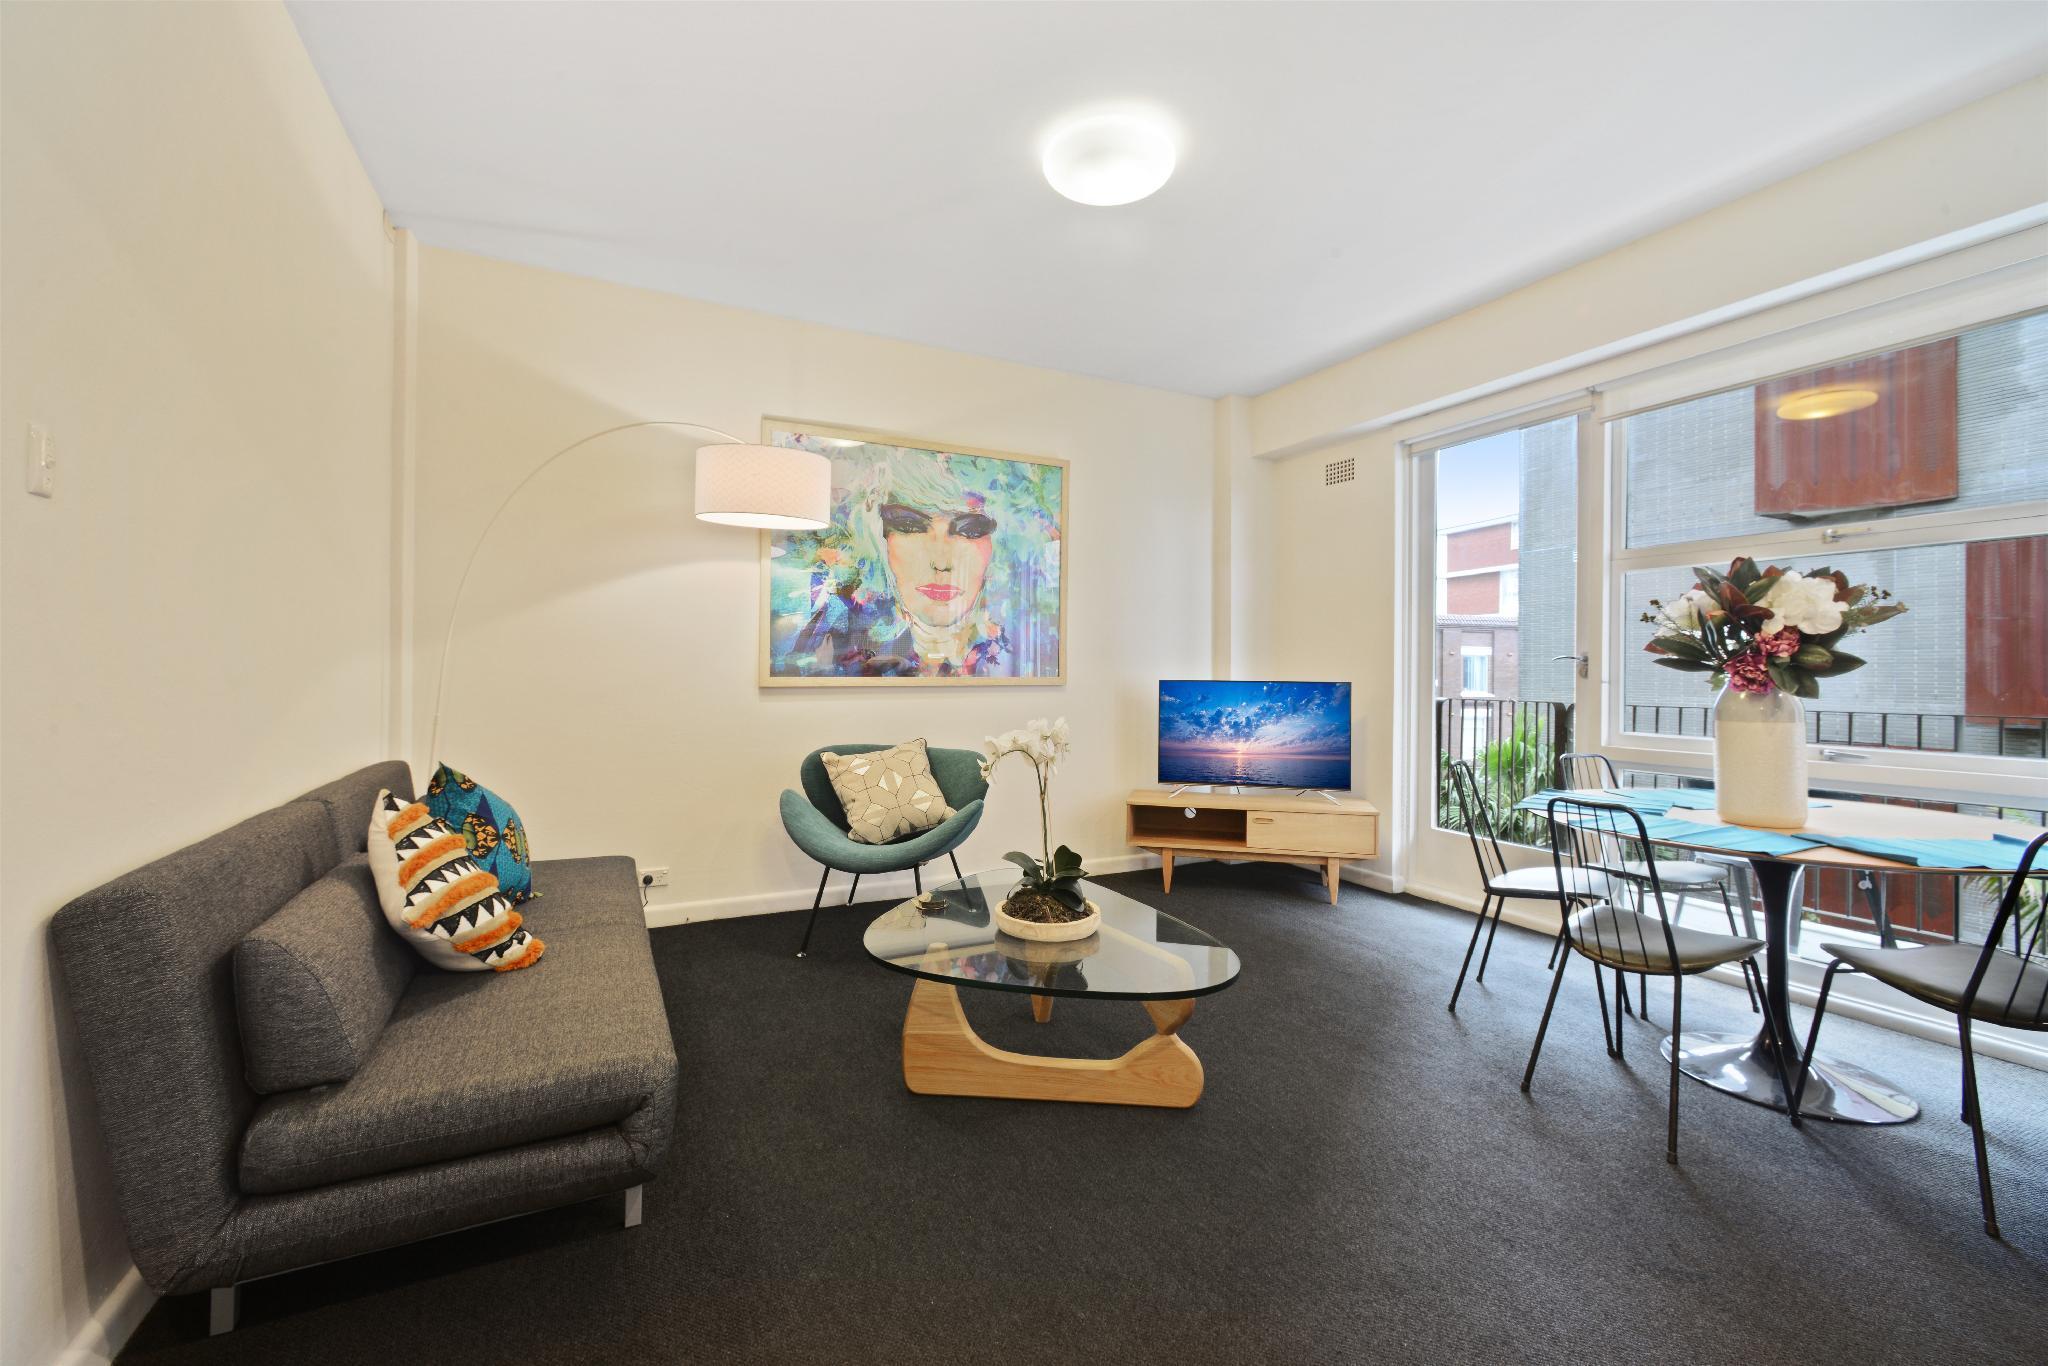 HomeHotel Urban Retreat In Secure Boutique Block